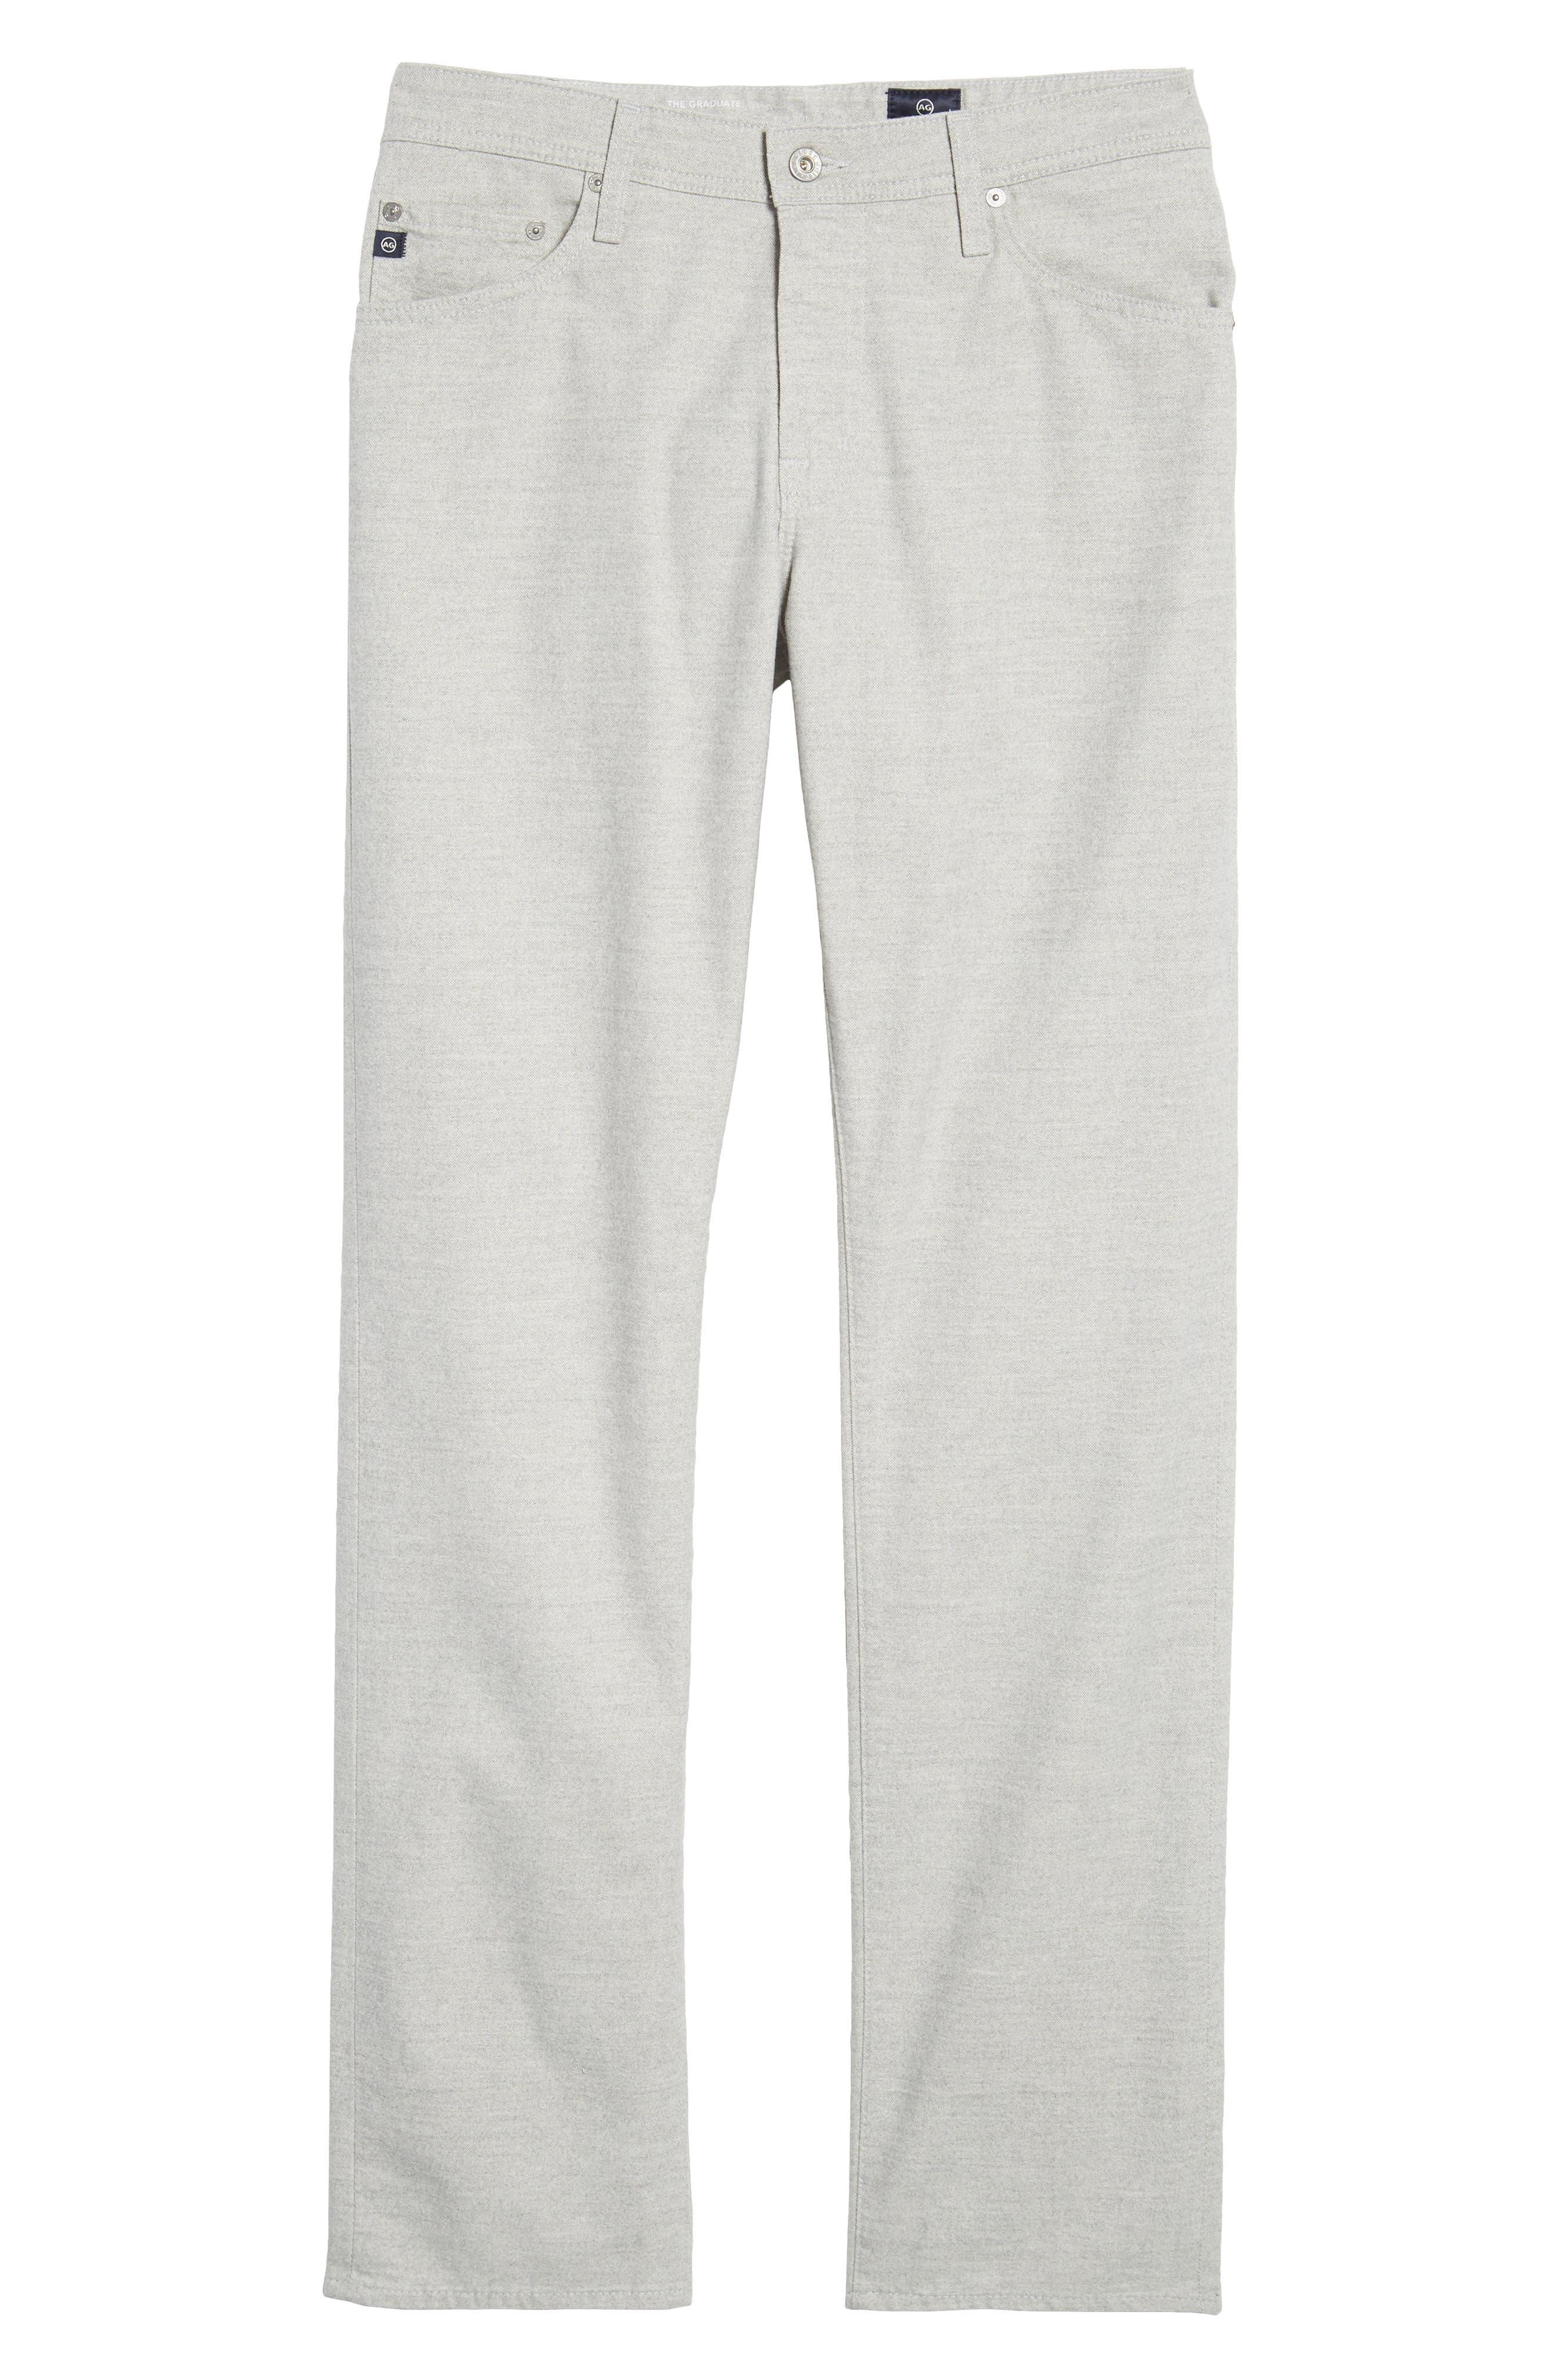 Graduate Tailored Five-Pocket Straight Leg Pants,                             Alternate thumbnail 6, color,                             020